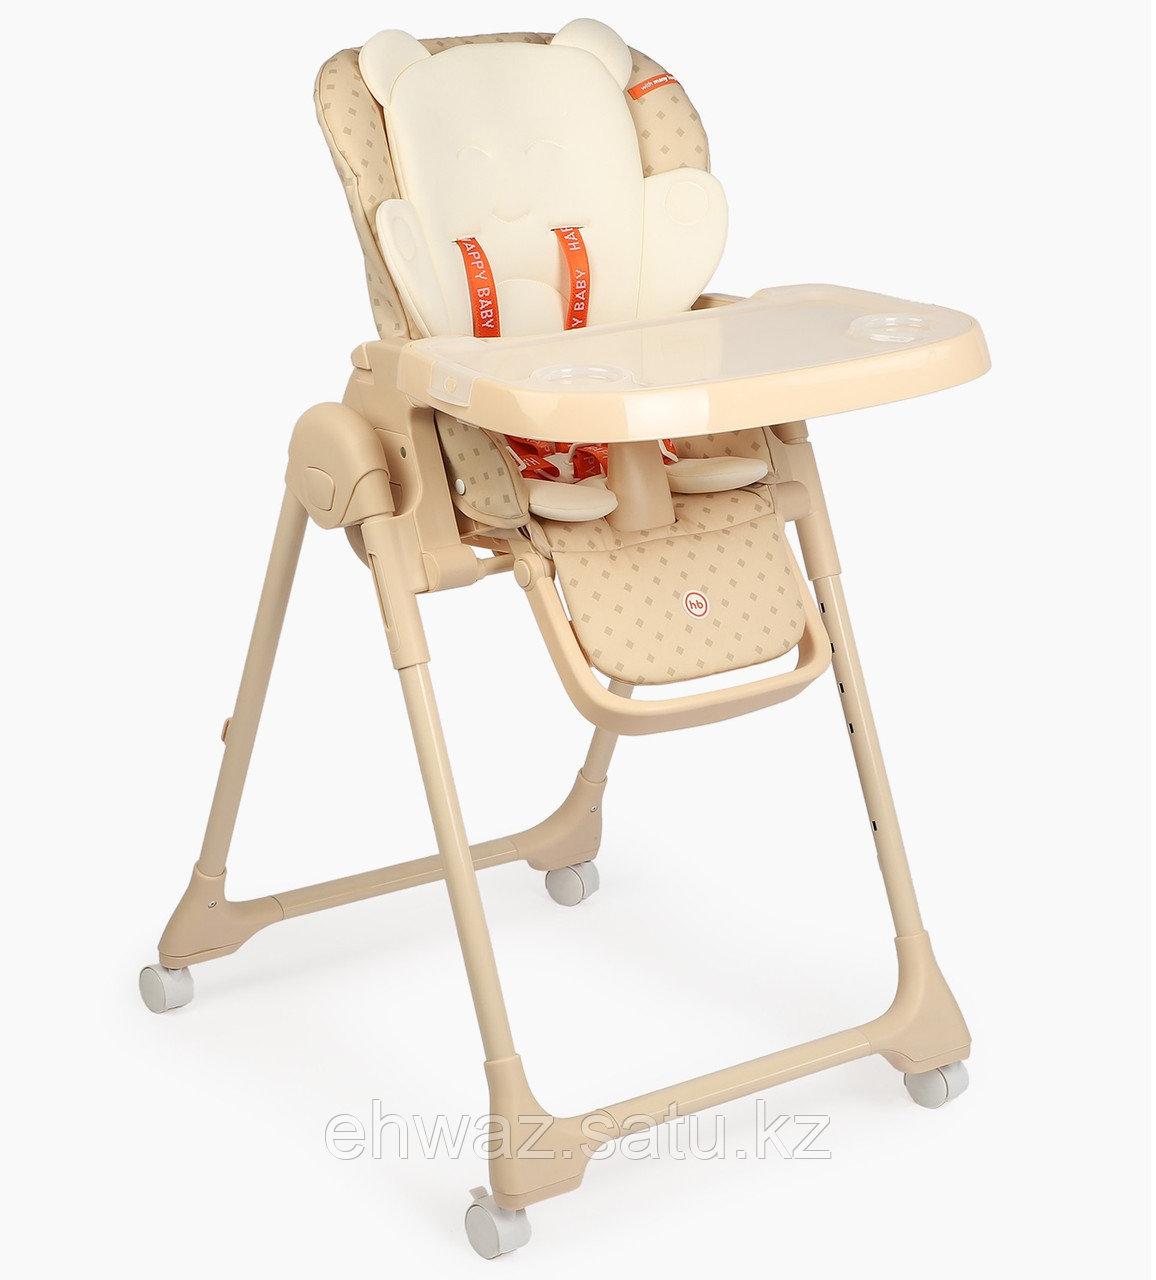 Стульчик для кормления Happy Baby William PRO Sand